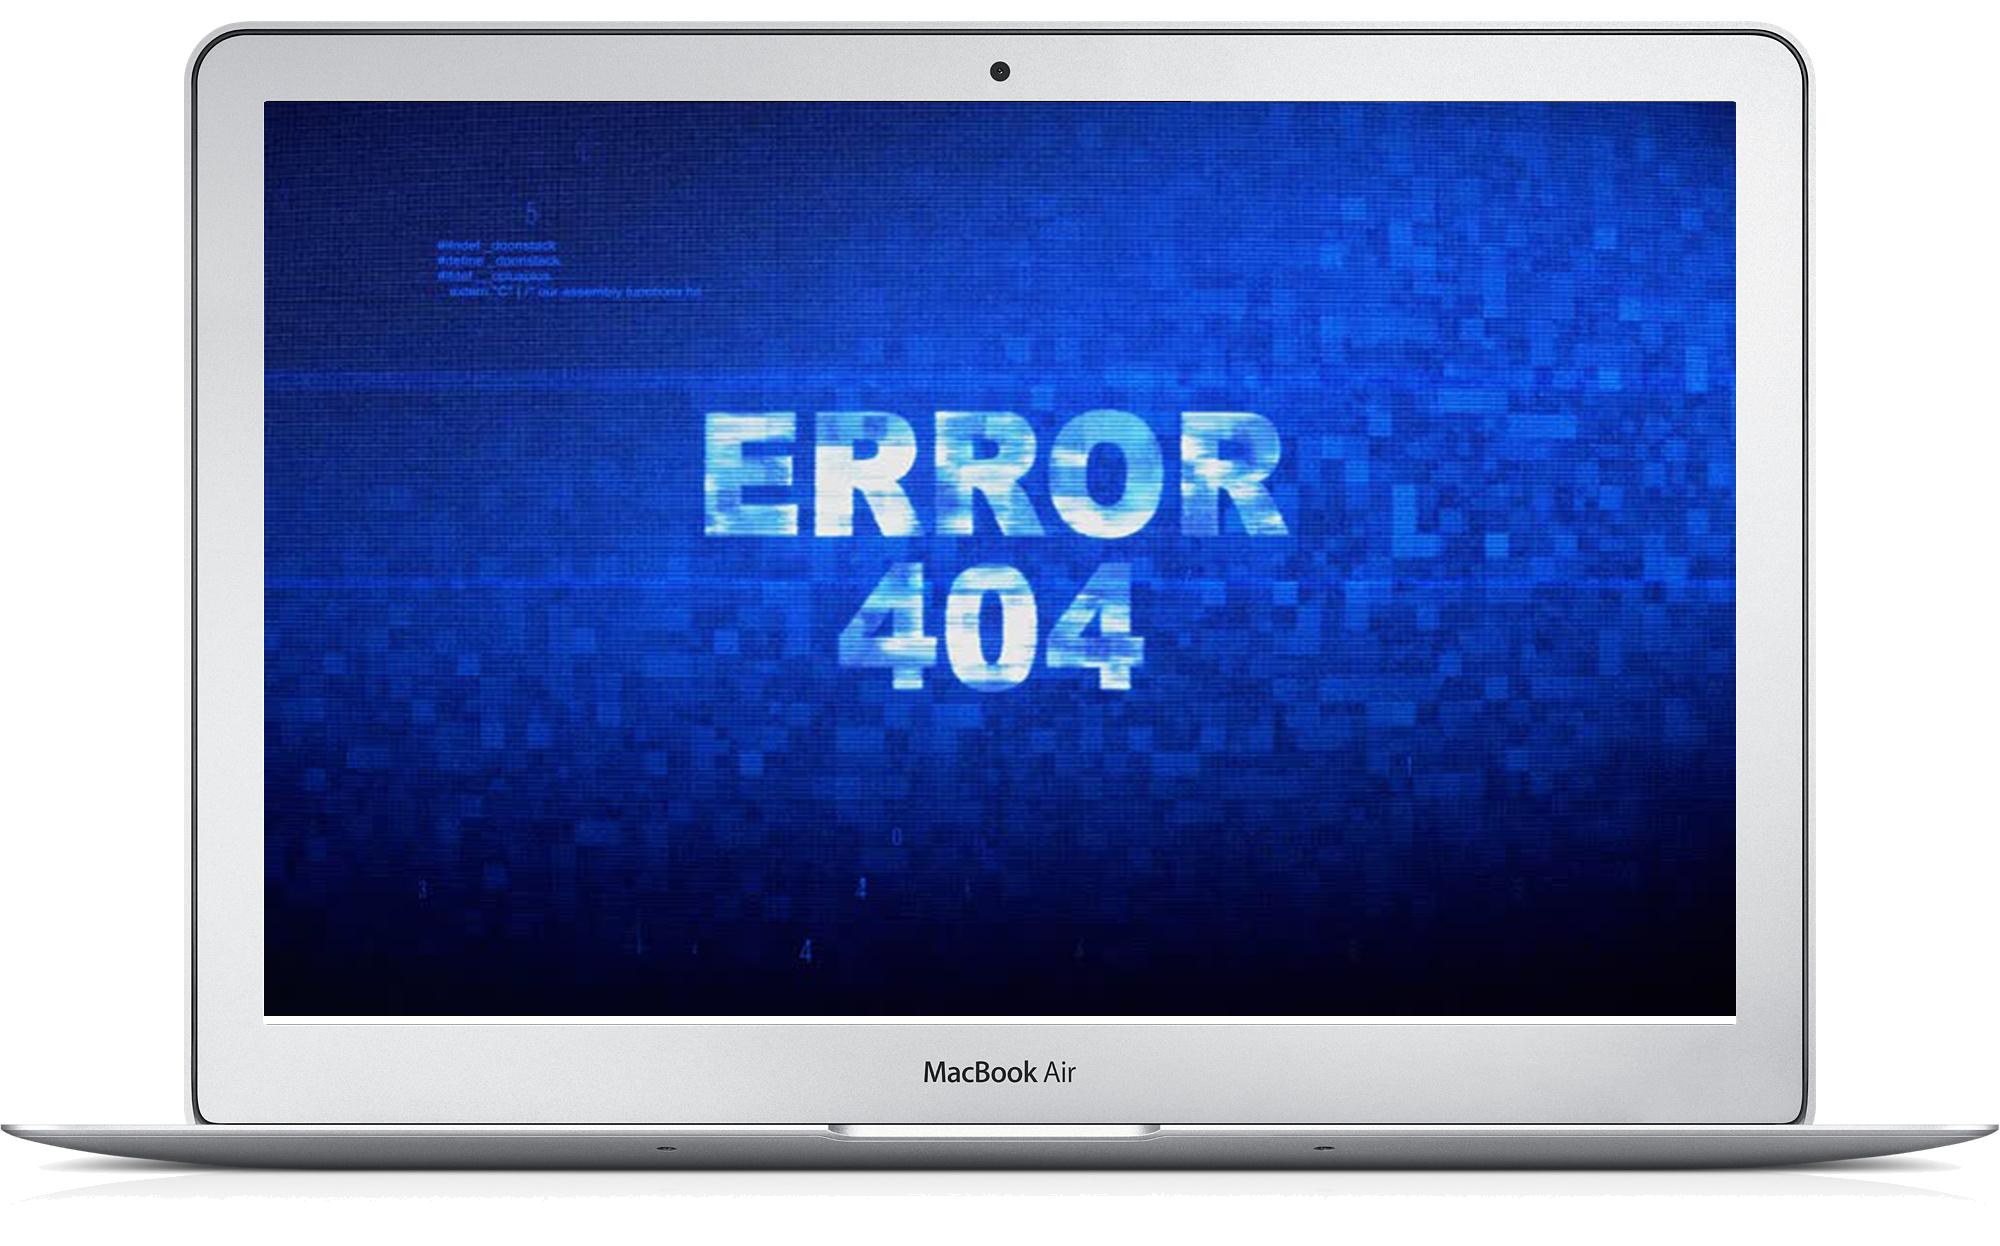 Jasa Perbaikan Website Wordpress dari Malware